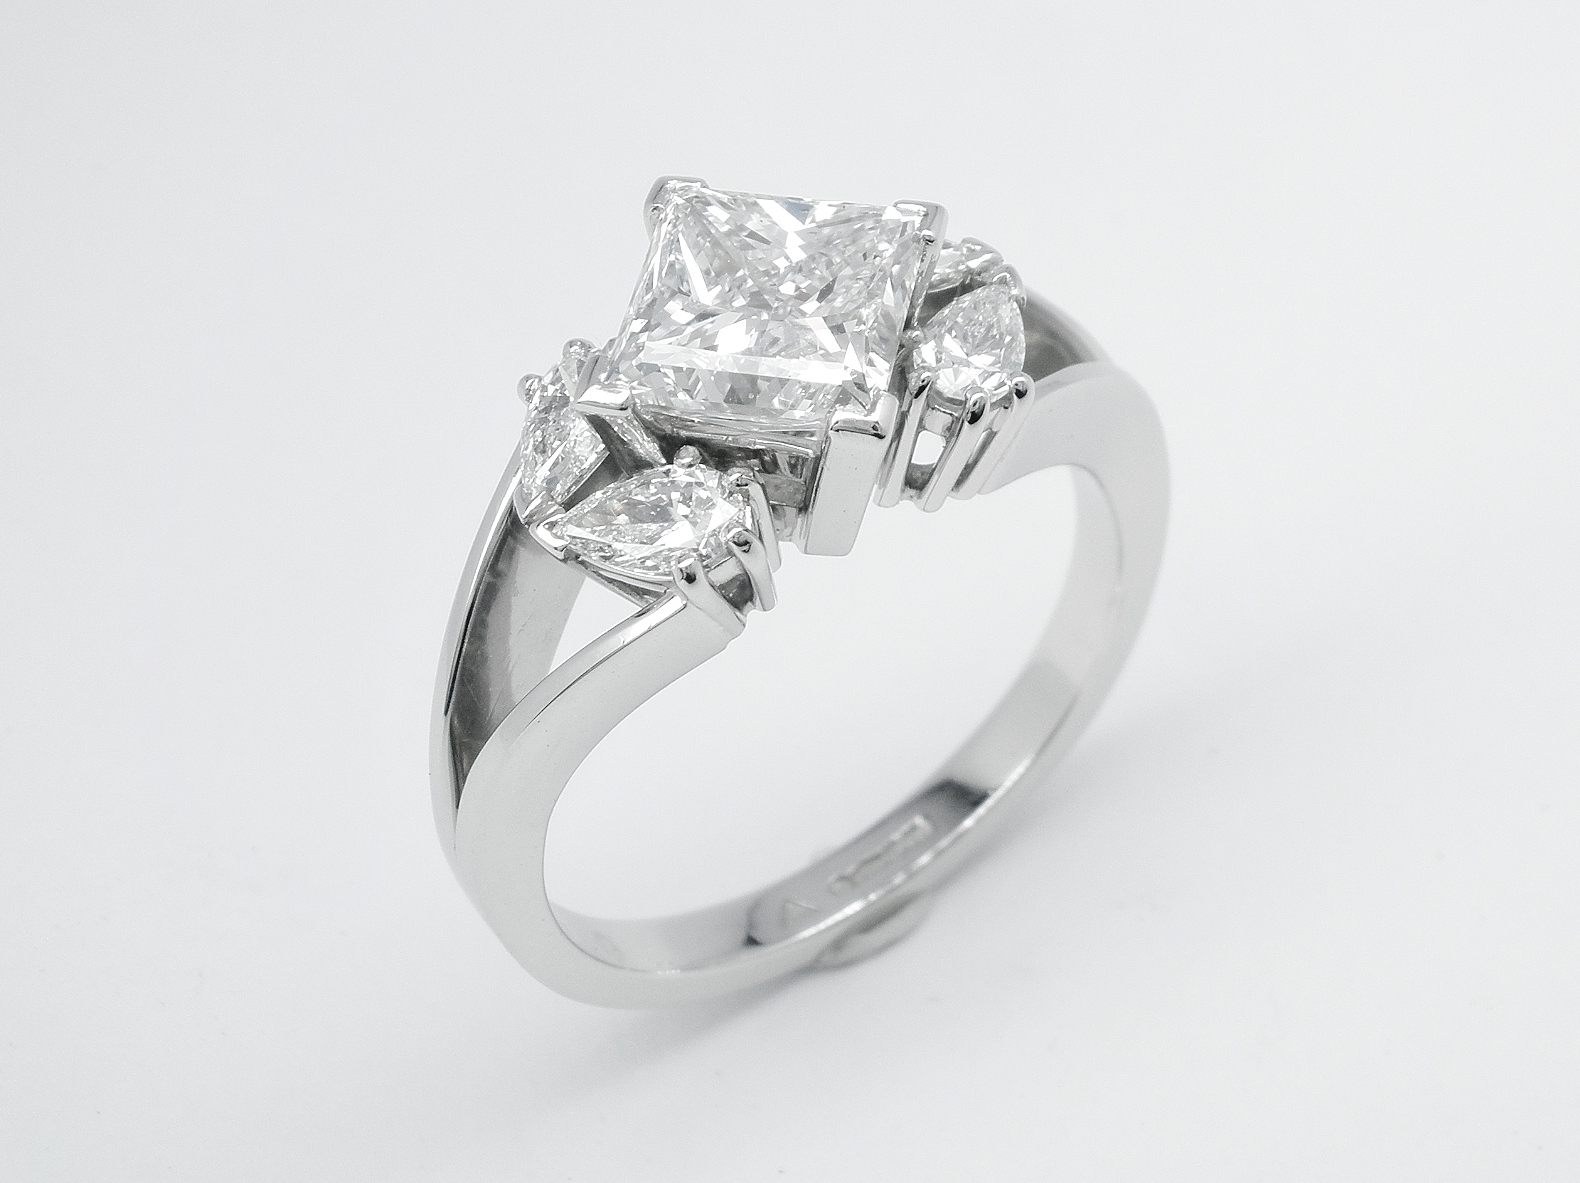 1.80ct. princess cut diamond & pear shaped diamond 5 stone platinum engagement ring.